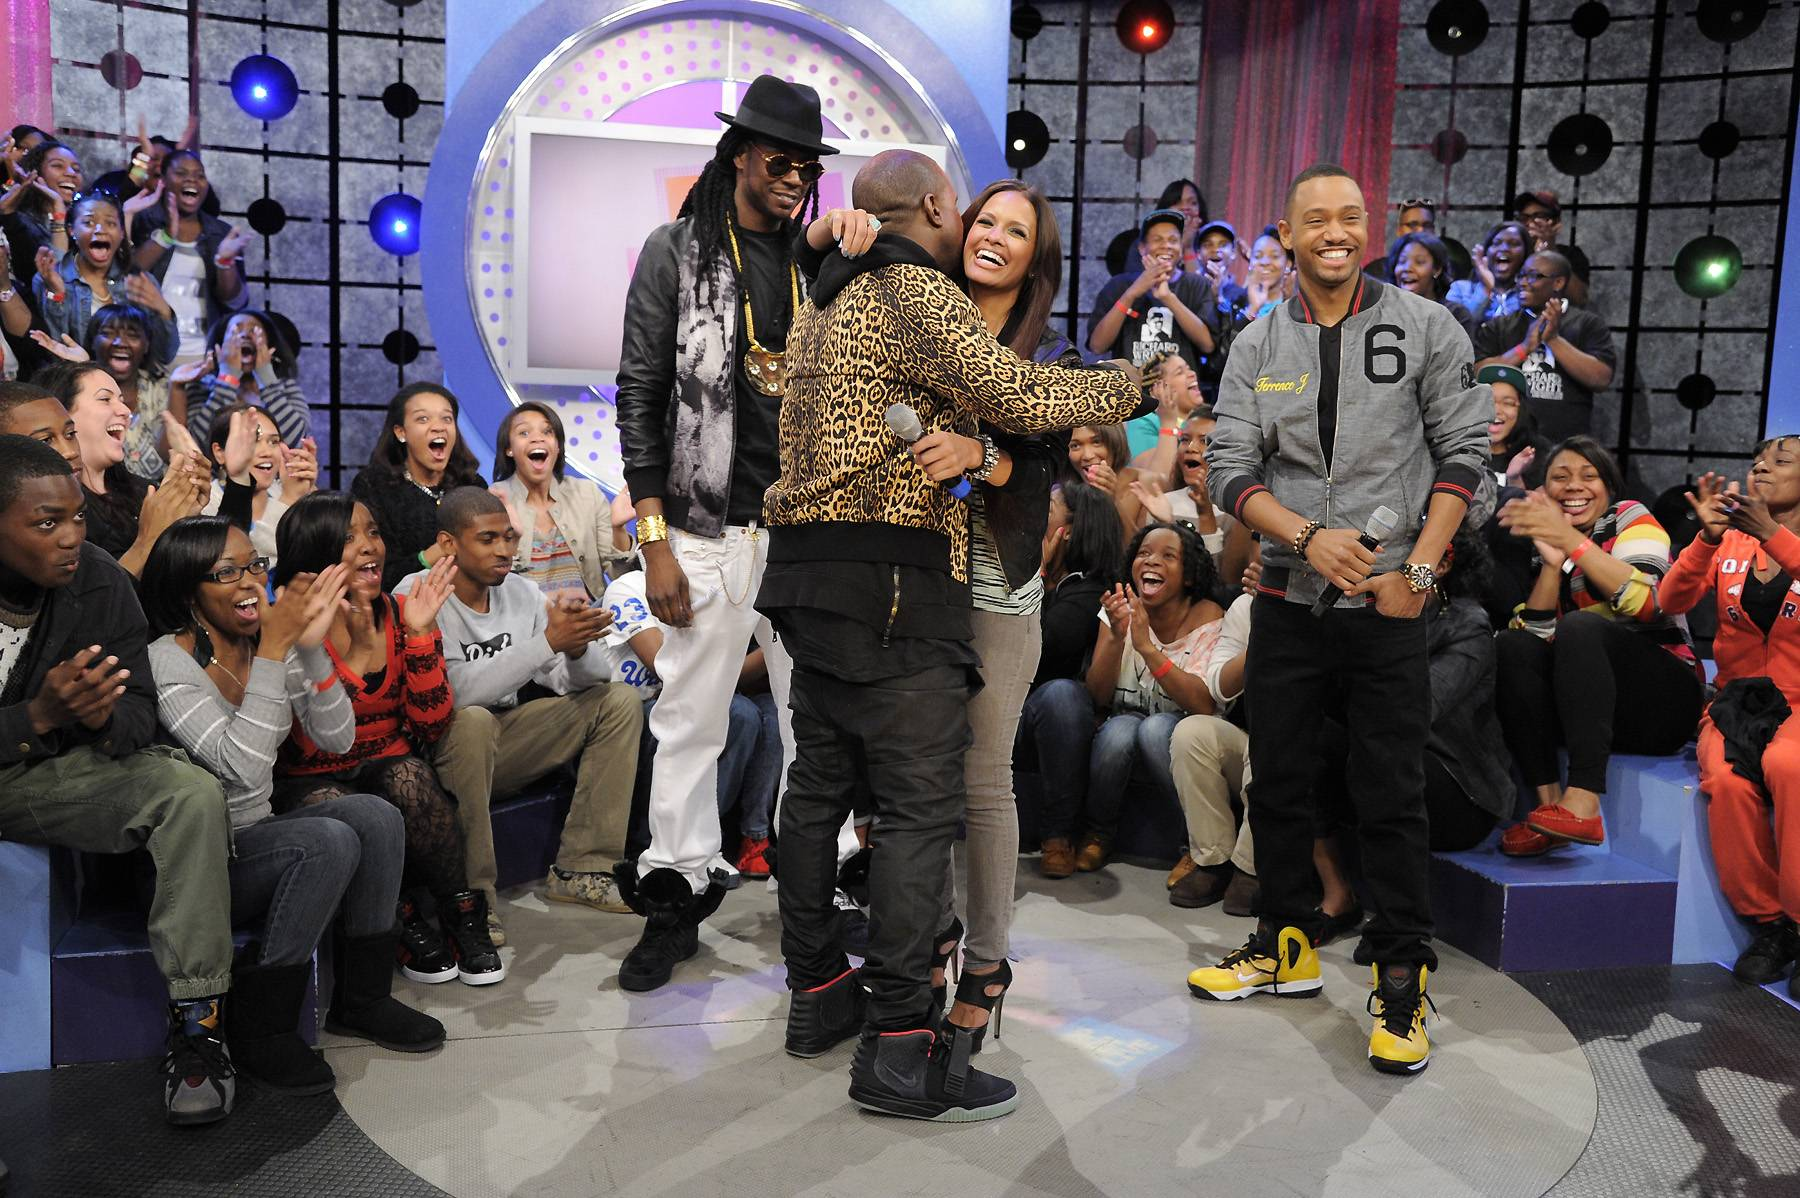 Hugs - Kanye West, 2 Chainz, Rocsi Diaz and Terrence J at 106 & Park, April 9, 2012. (photo: John Ricard / BET)